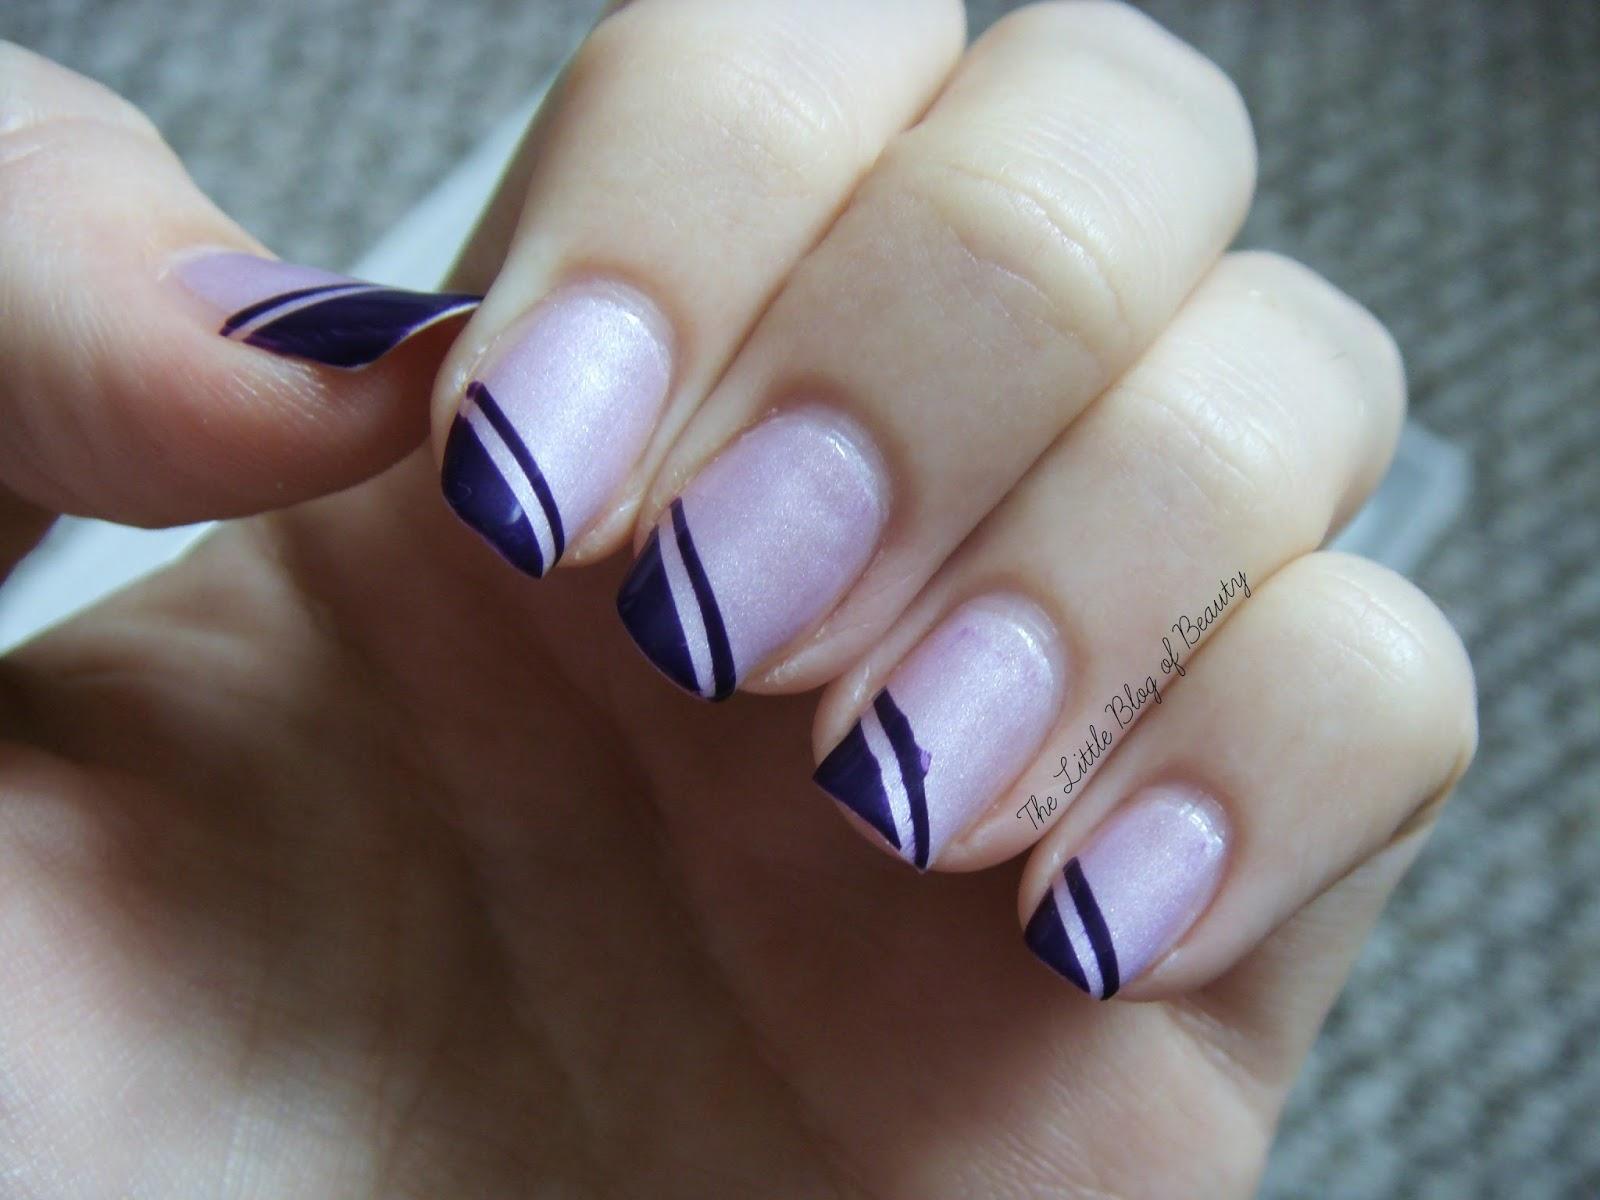 Nail art - Geometric corners | The Little Blog of Beauty